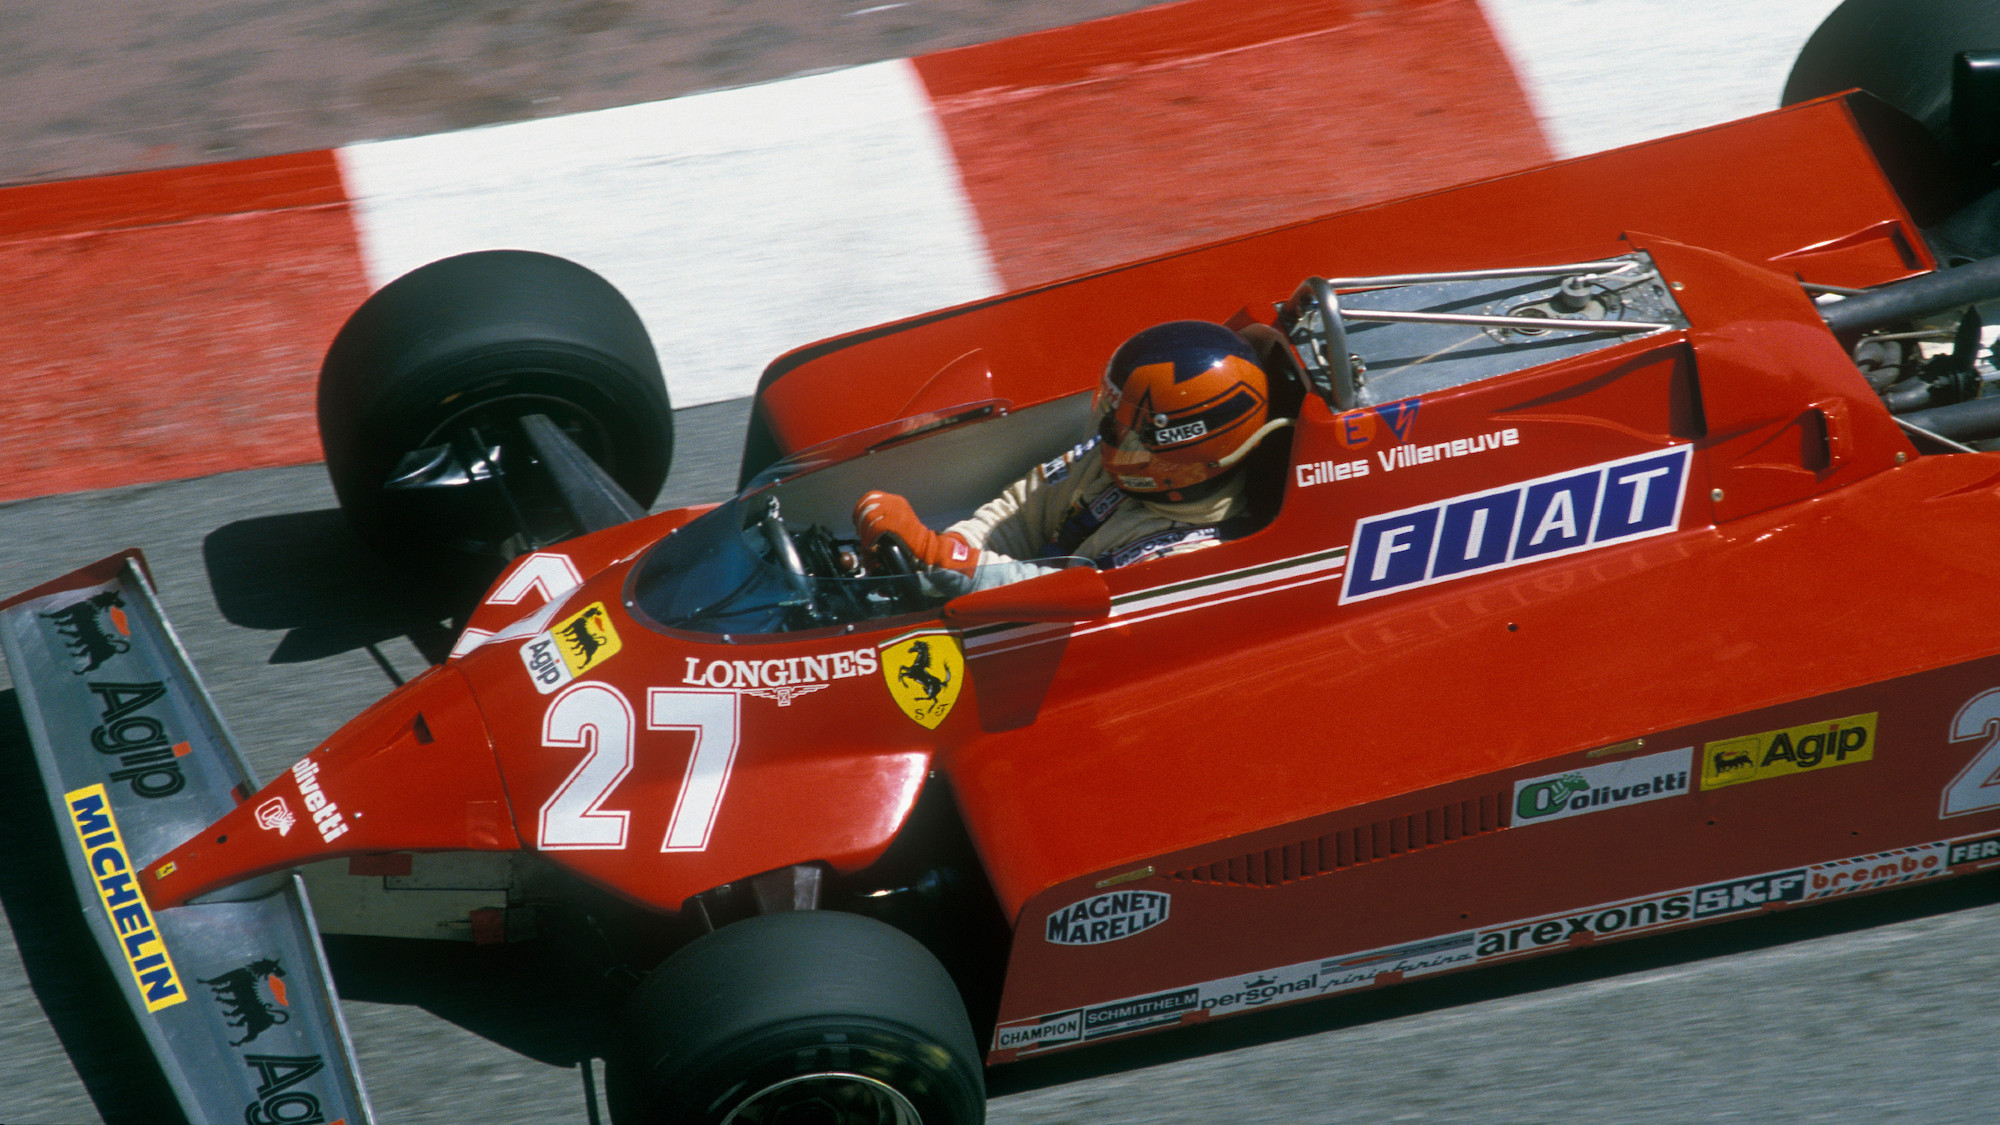 Gilles Villeneuve, Monaco GP 1981